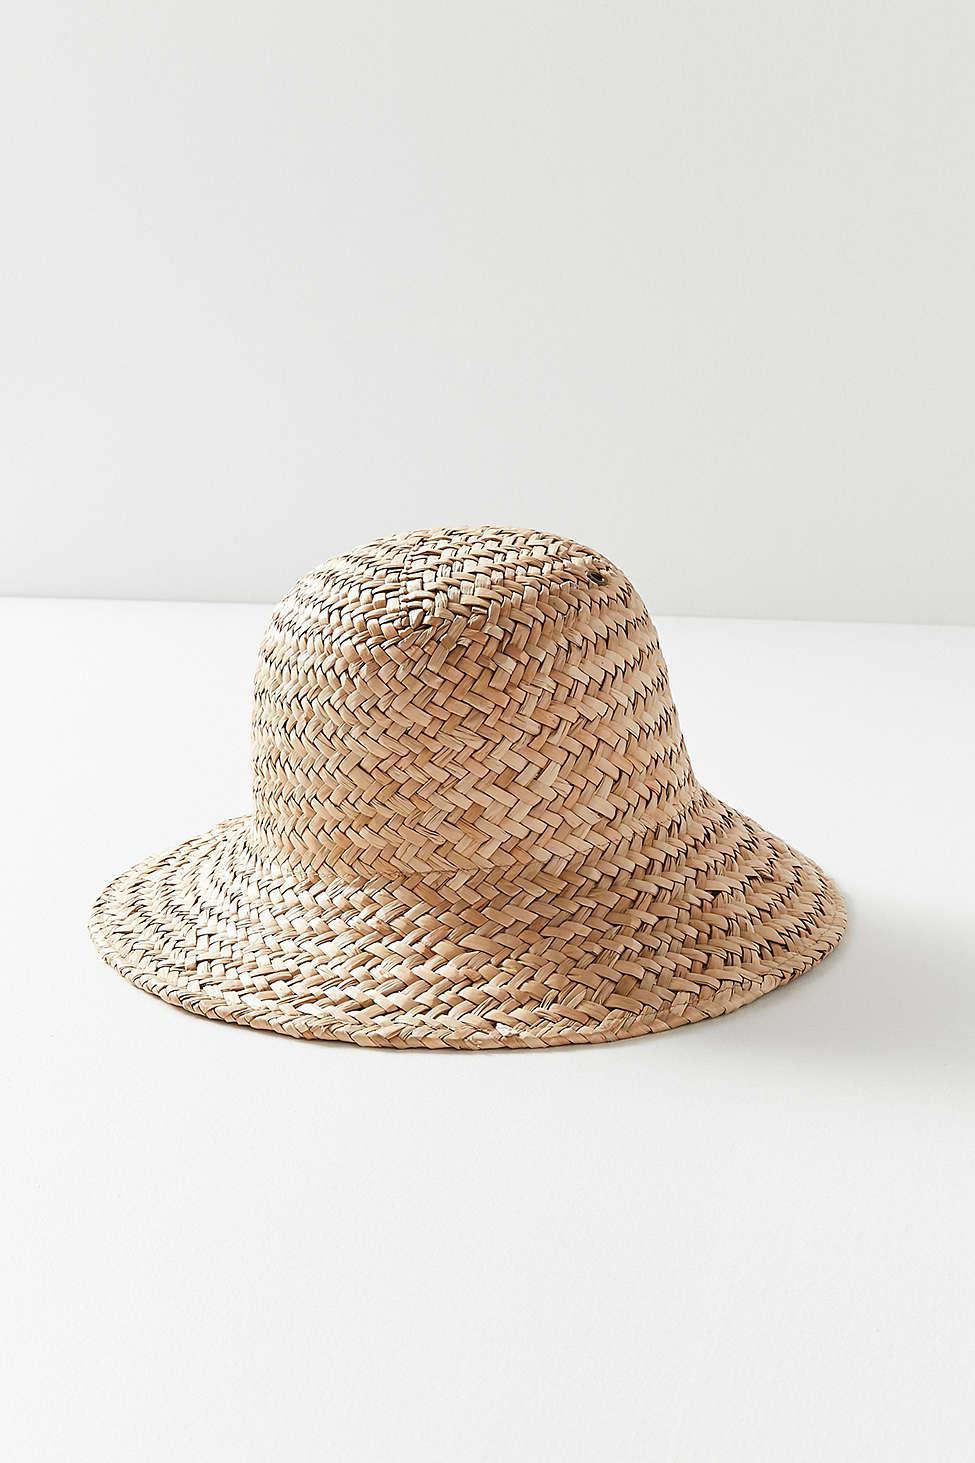 Lyst - Brixton Kennedy Straw Bucket Hat in Natural 200e0f27e2f